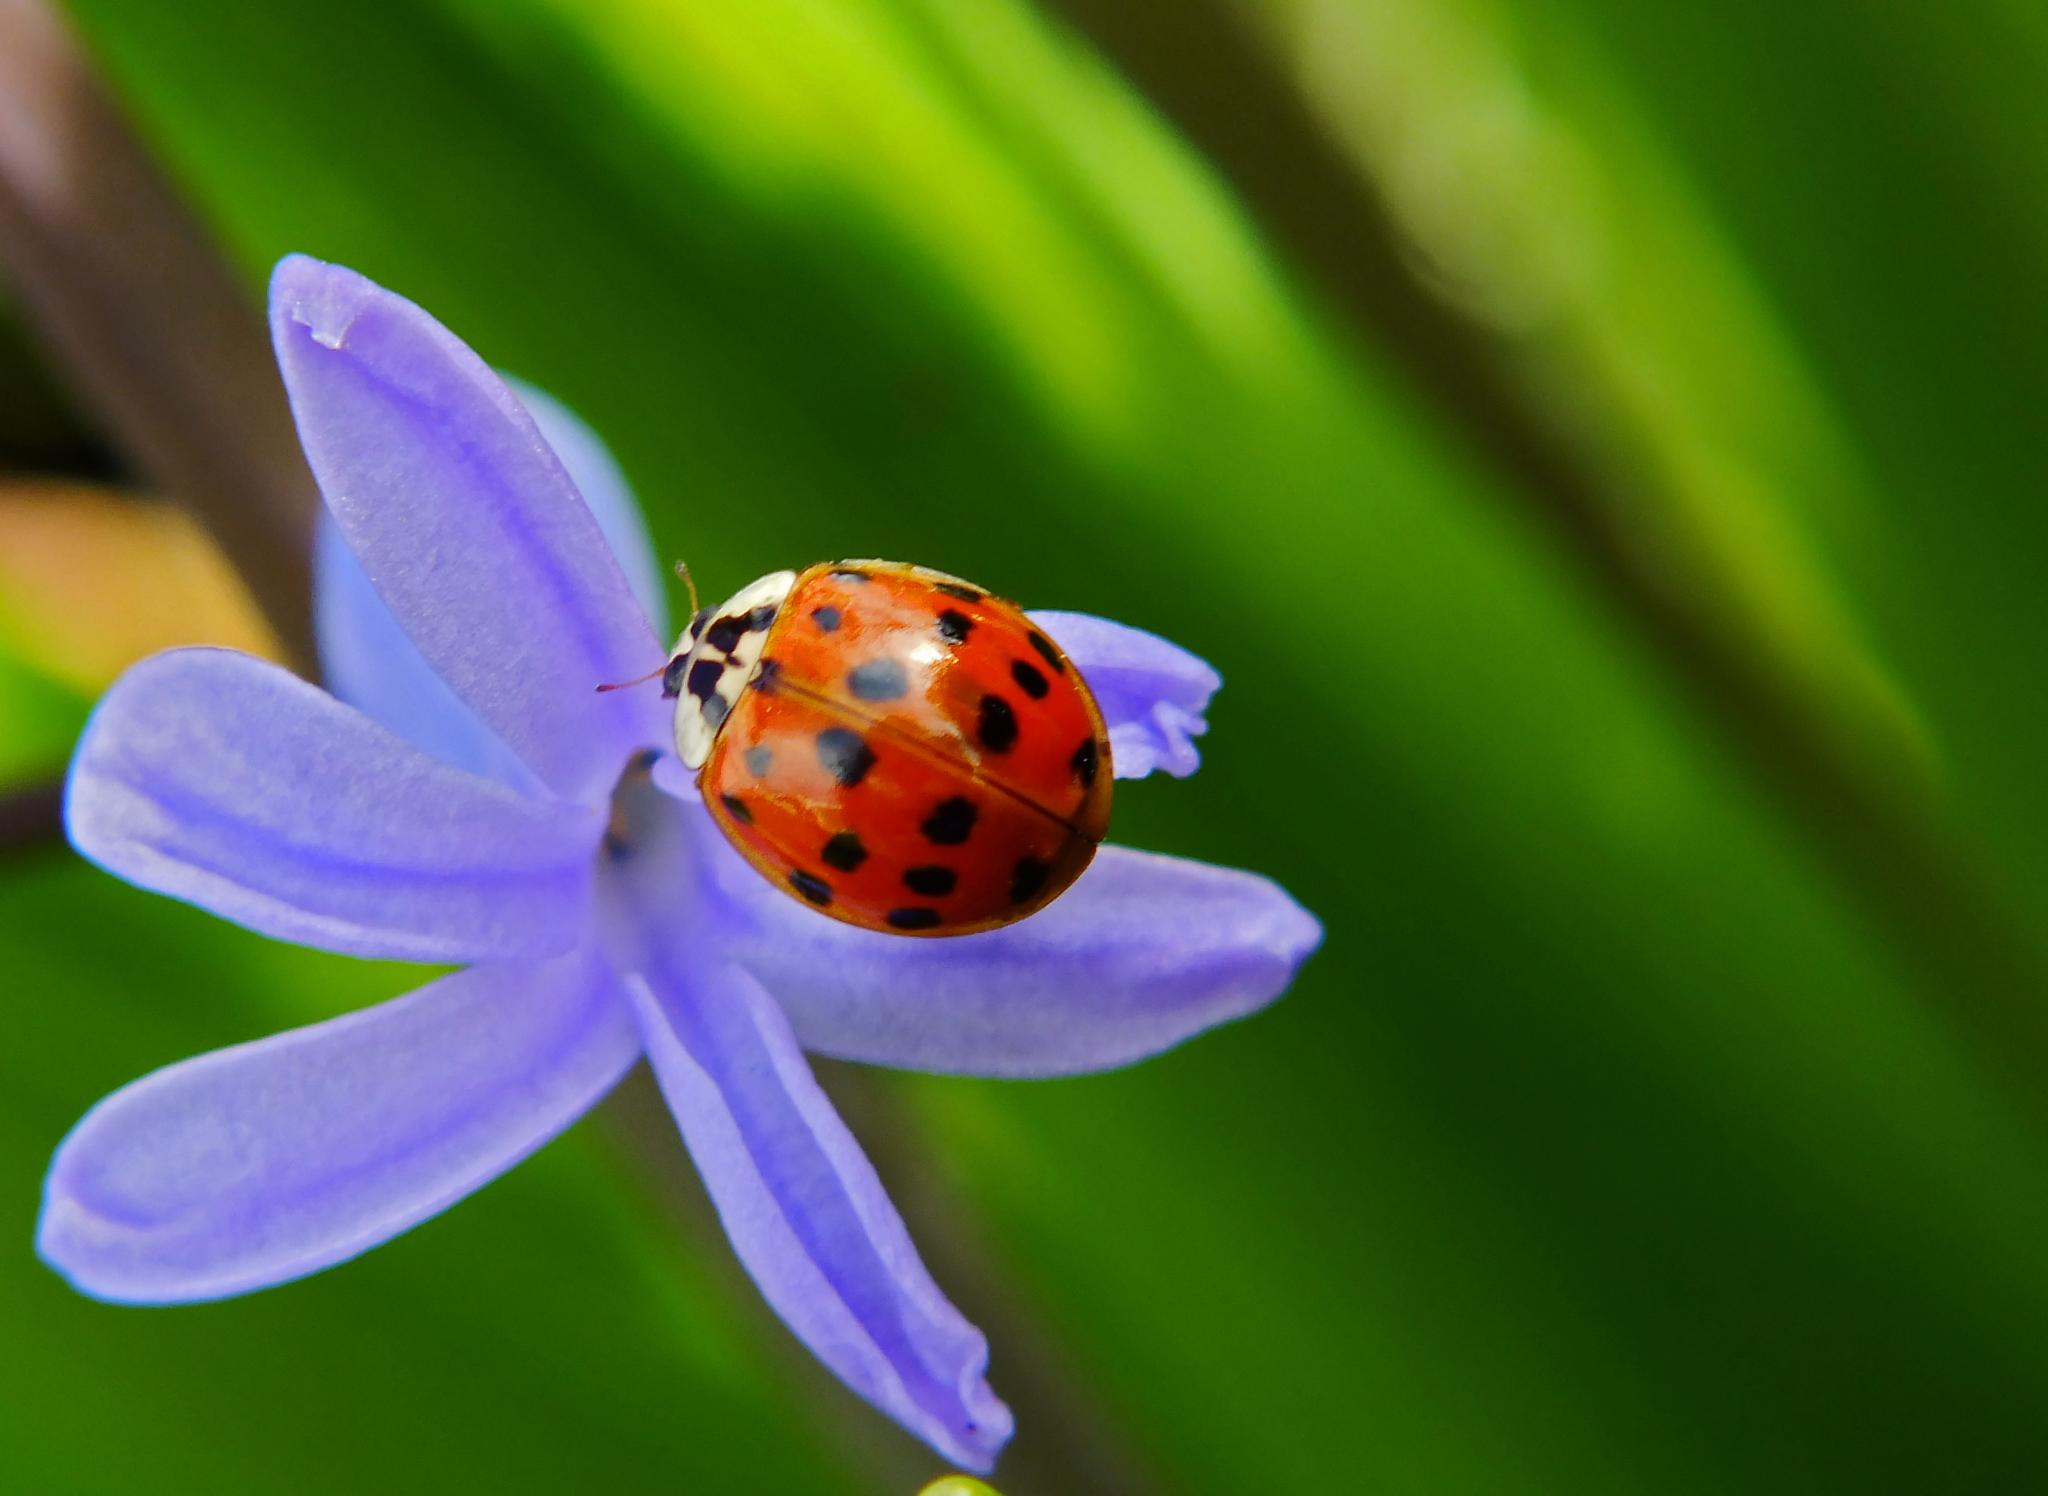 ladybug by Banhidai Beata